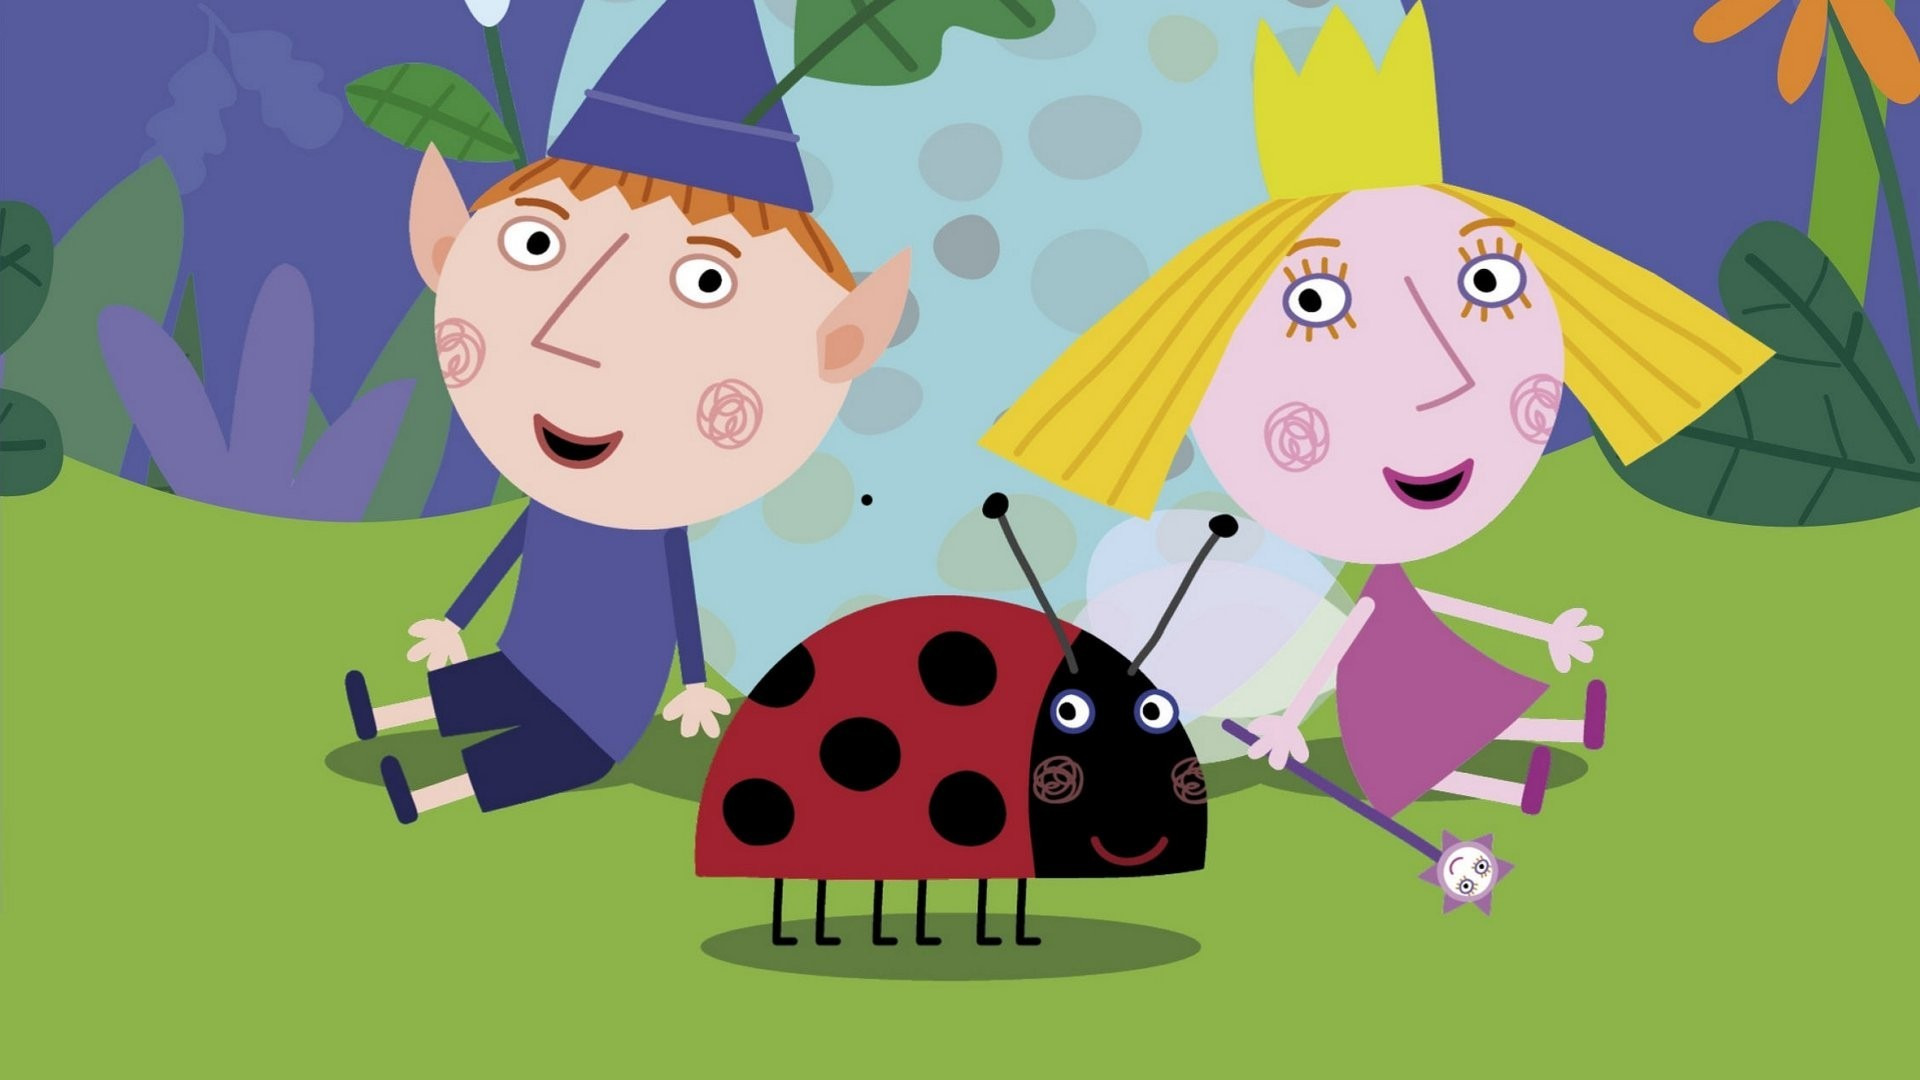 Show Ben & Holly's Little Kingdom